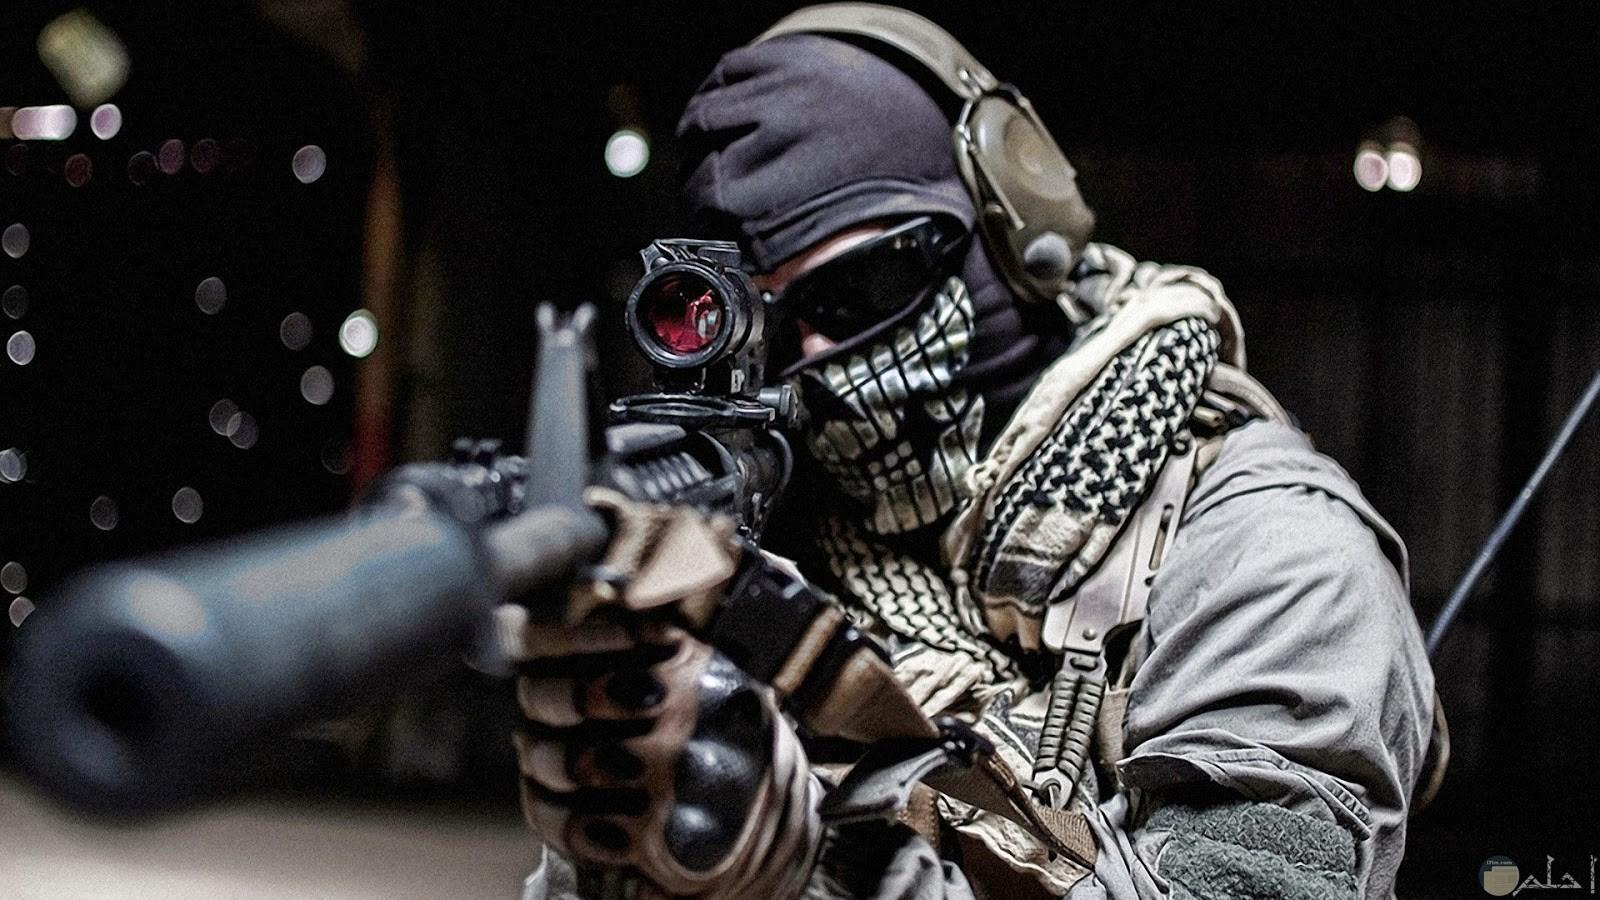 رجل ملتم وبيده سلاح ويرتدي نظاره